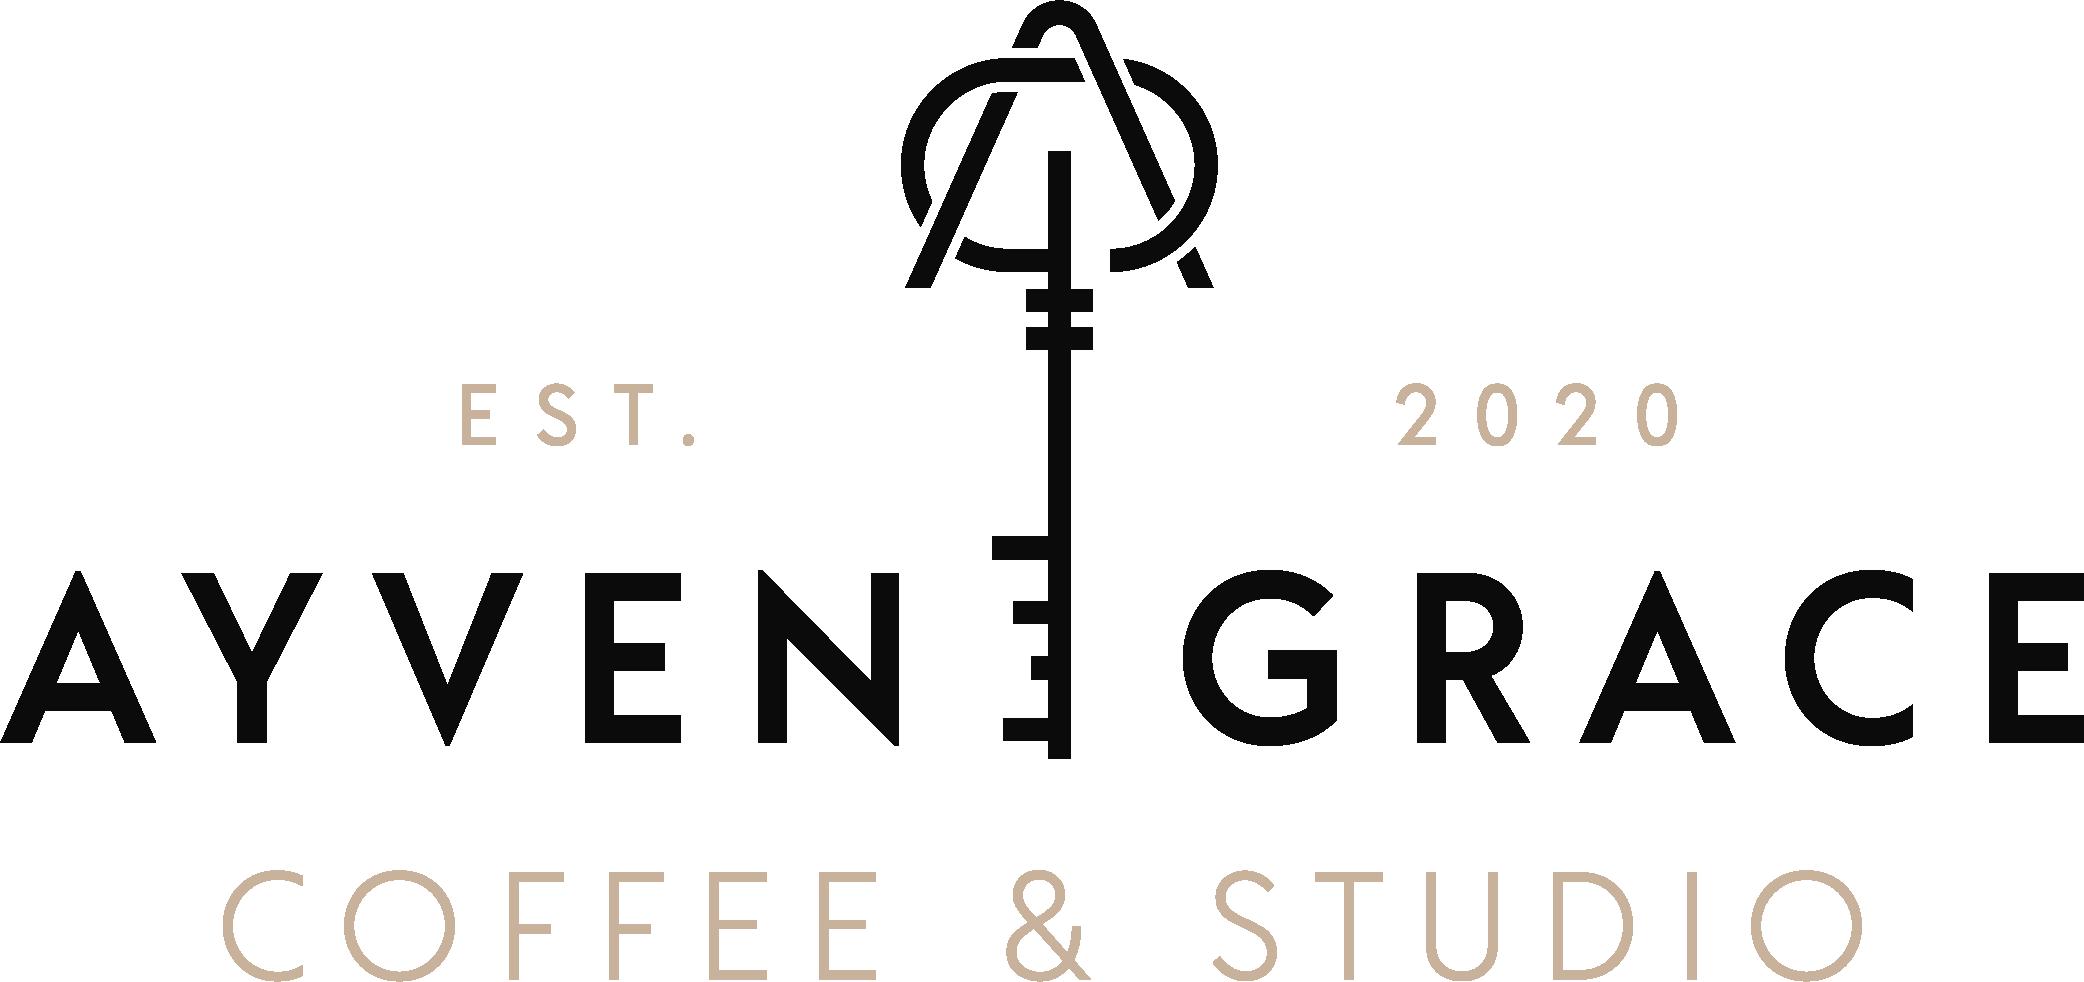 Design a Eye Catching Coffee shop & Studio logo